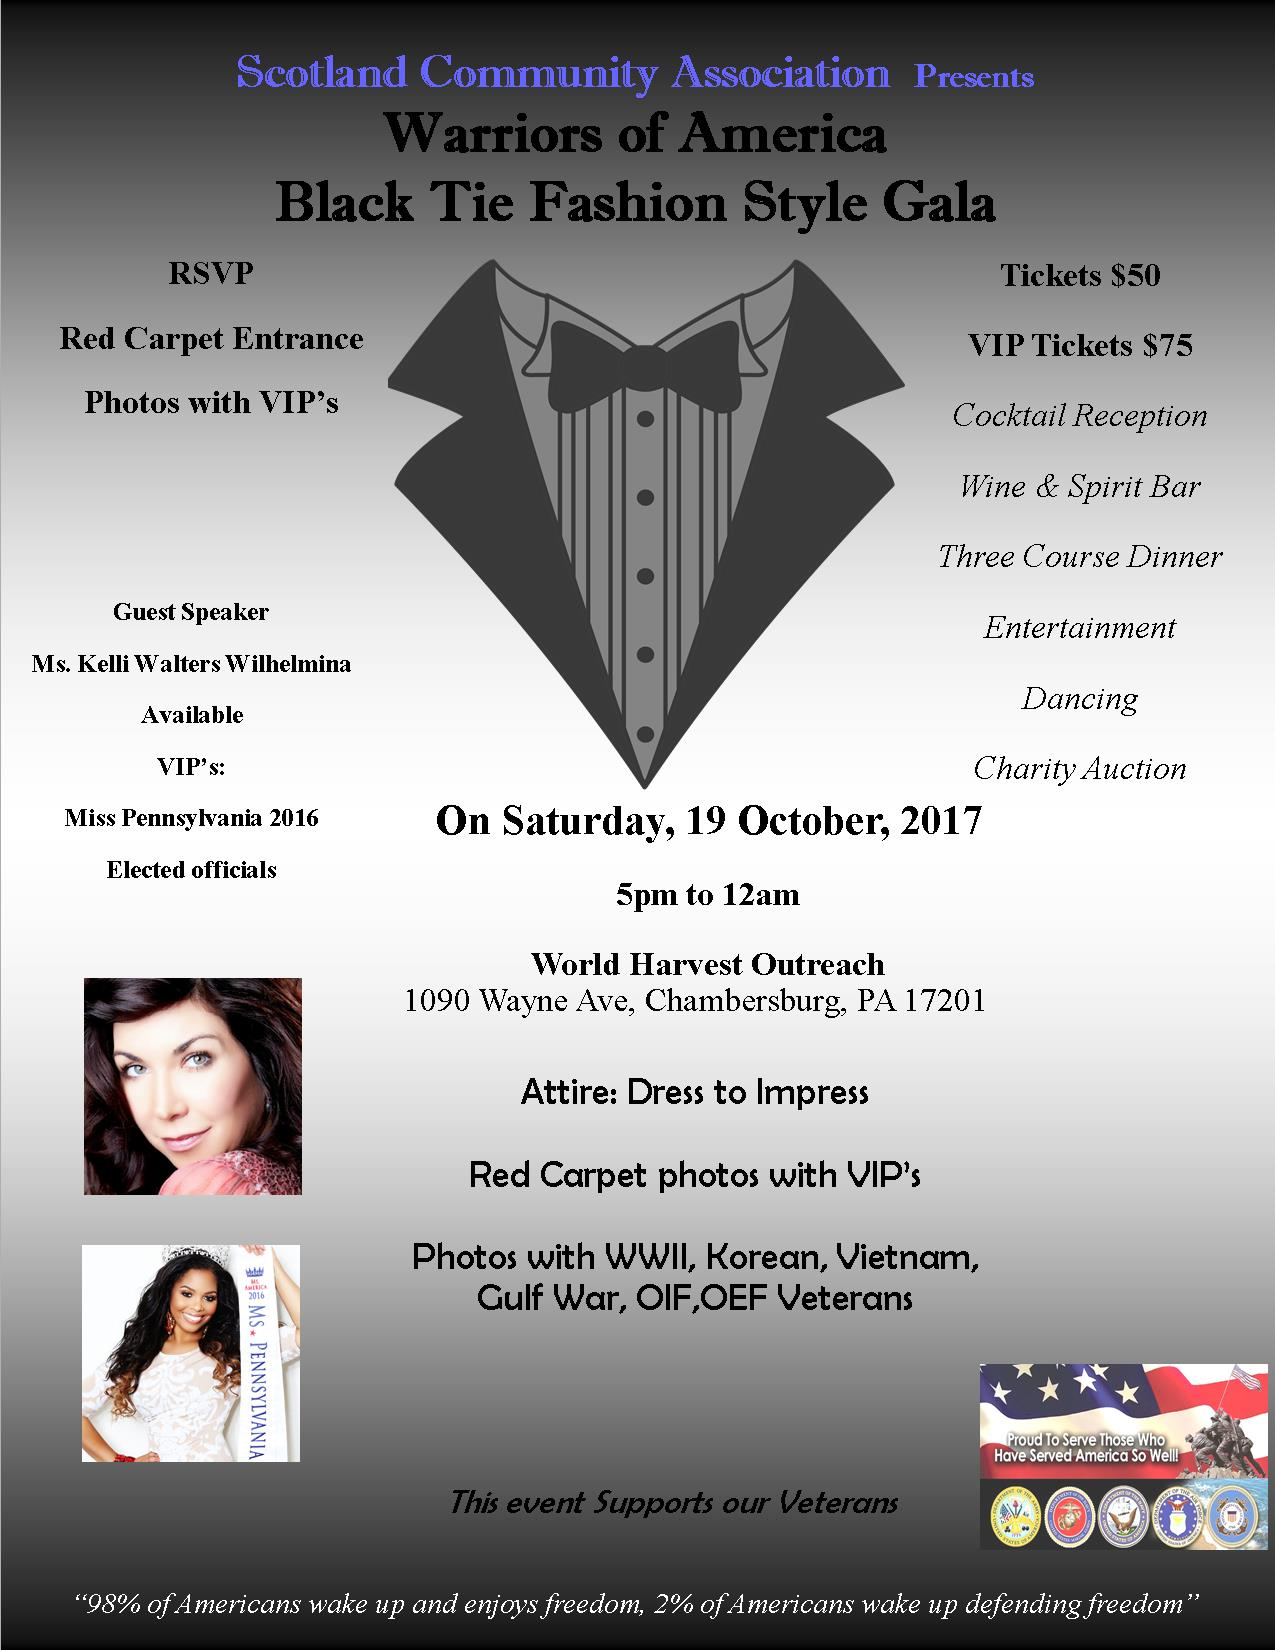 Black Tie Fashion Style Gala